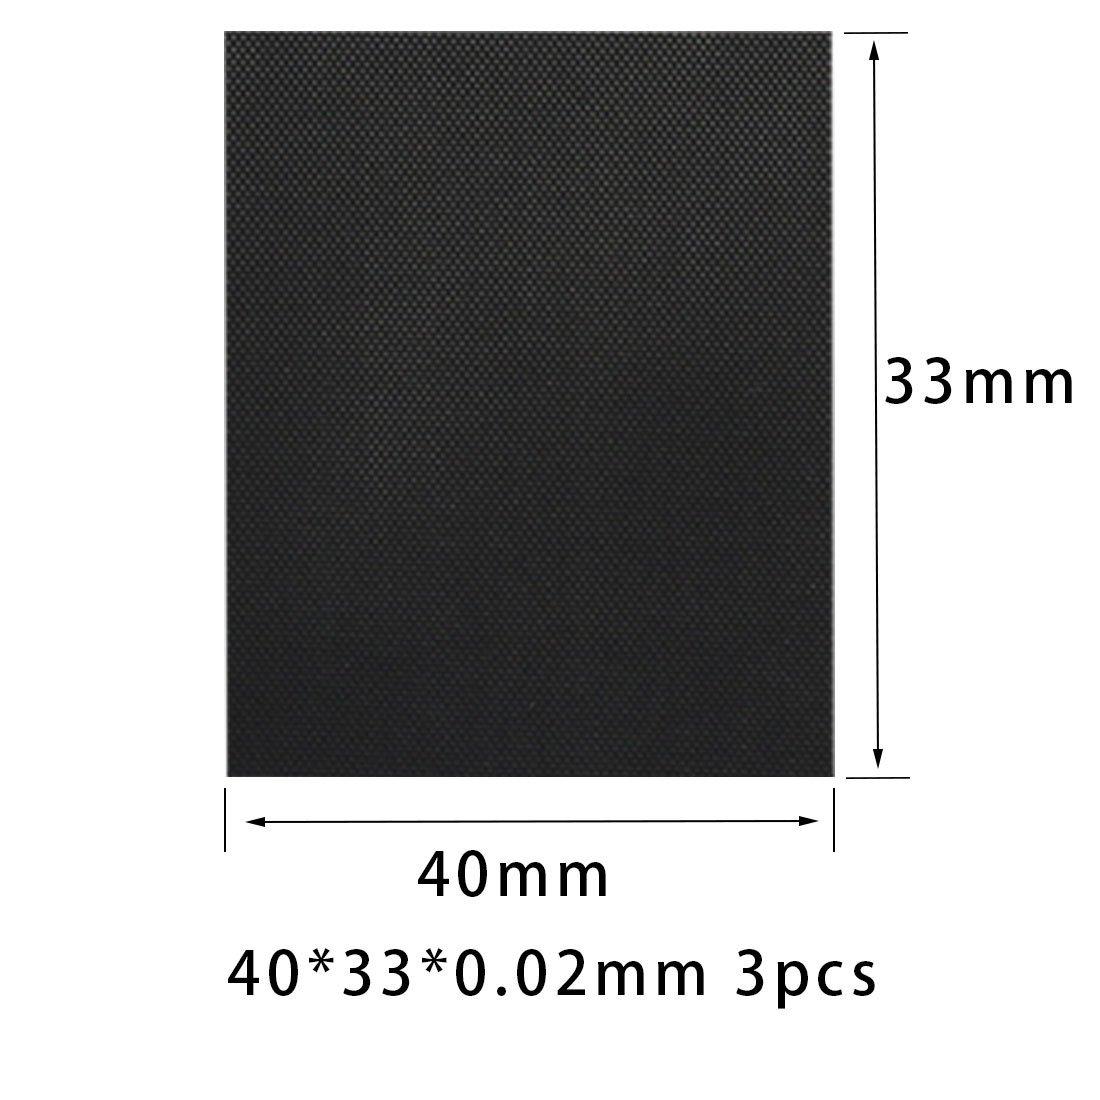 Amazon.com: eDealMax 16x13 pulgadas 3 piezas Parrilla Mat Conjunto antiadherente utensilios Barbacoa Gas de carbón eléctrico Hoja de cocina: Home & Kitchen